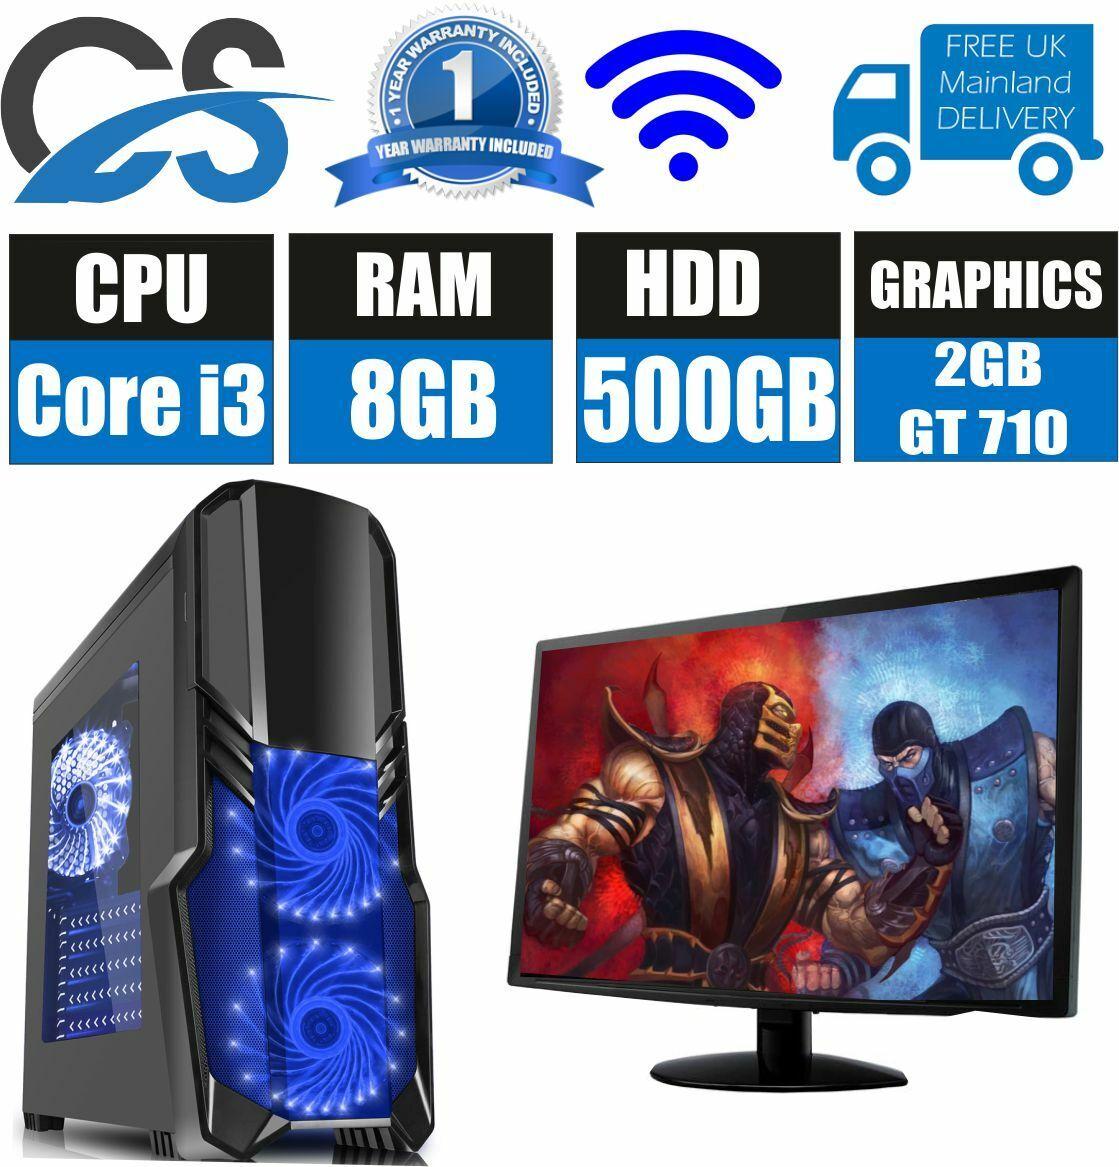 Computer Games - SUPER FAST GAMING COMPUTER PC INTEL CORE i3 8GB RAM 500GB HDD 2GB GT 710 WIFI